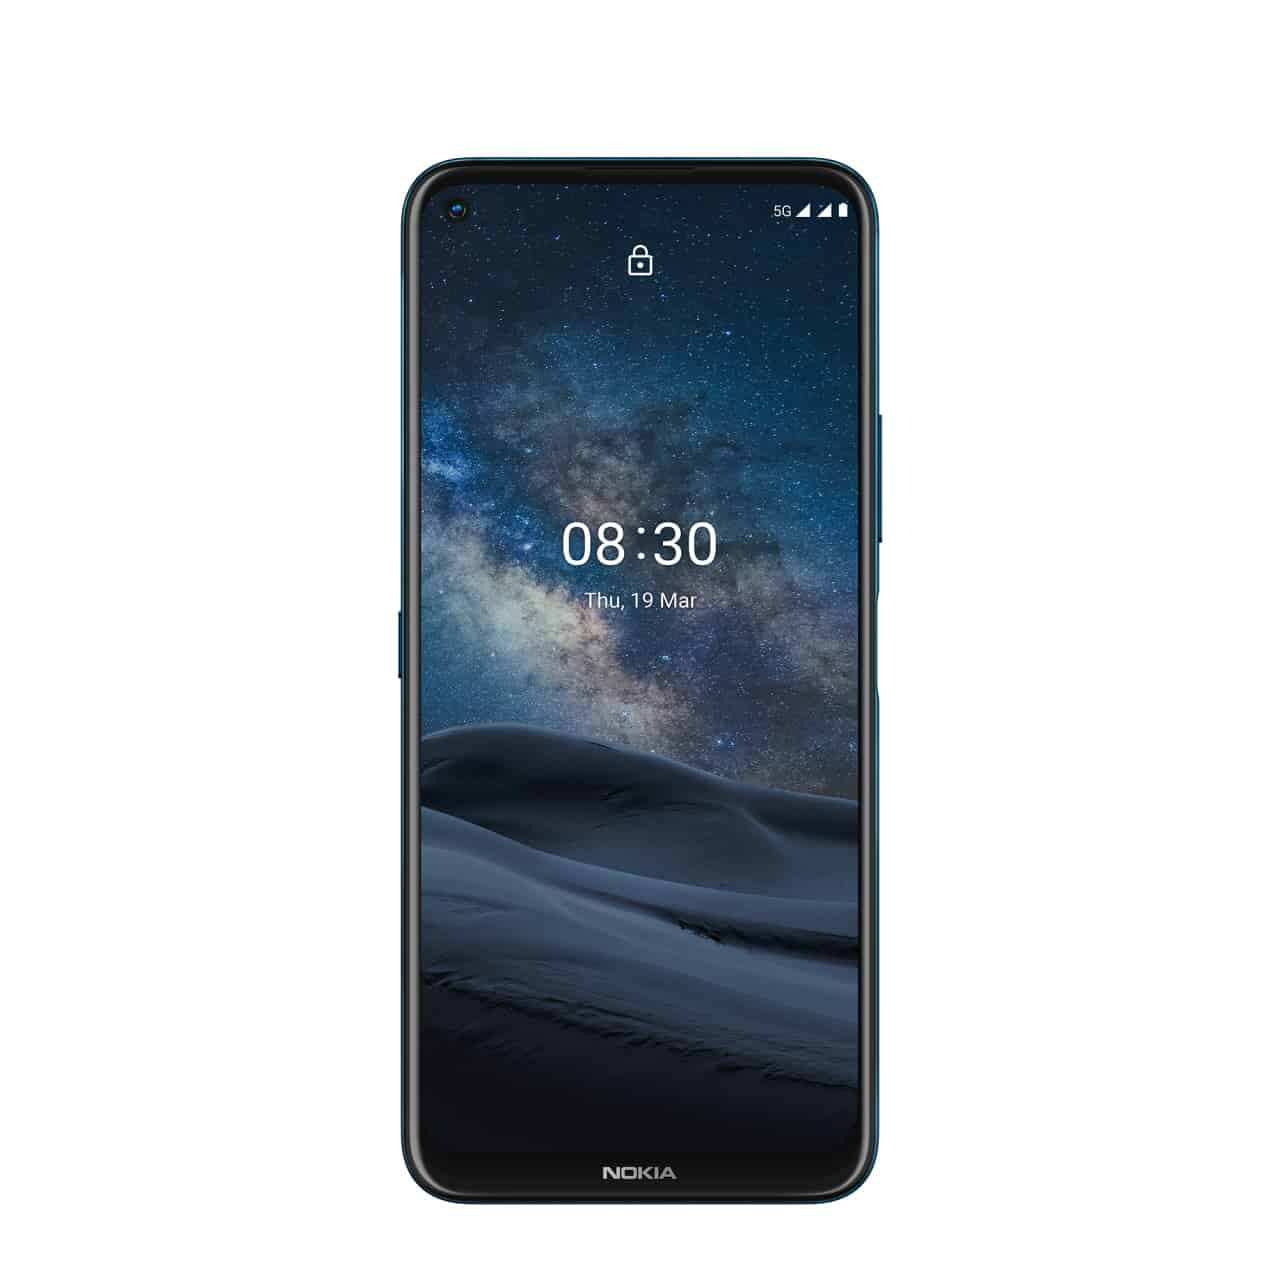 Nokia 8 3 5G image 4